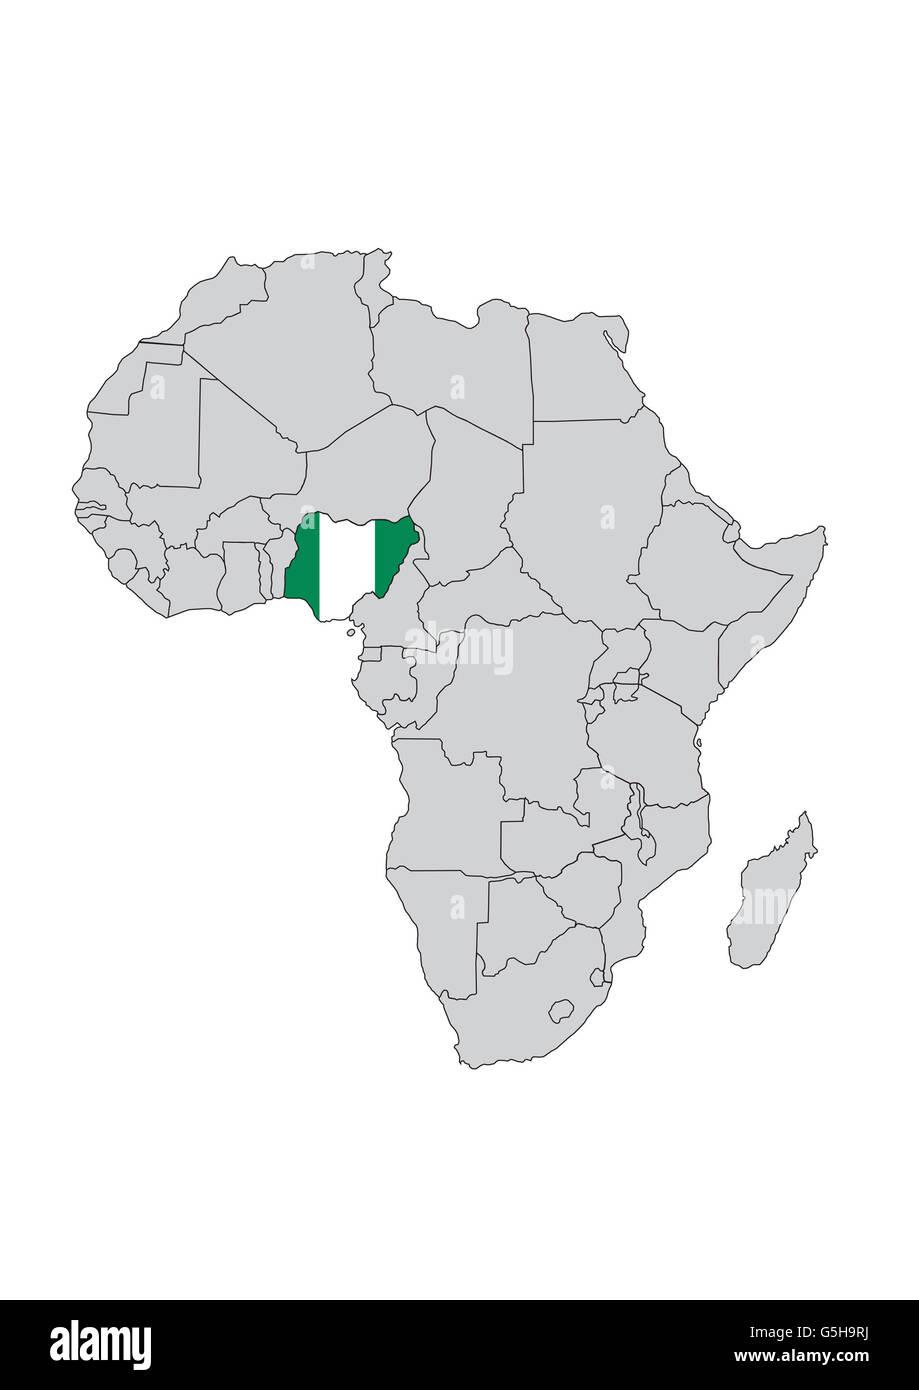 Africa Nigeria Map Stock Photos & Africa Nigeria Map Stock Images ...